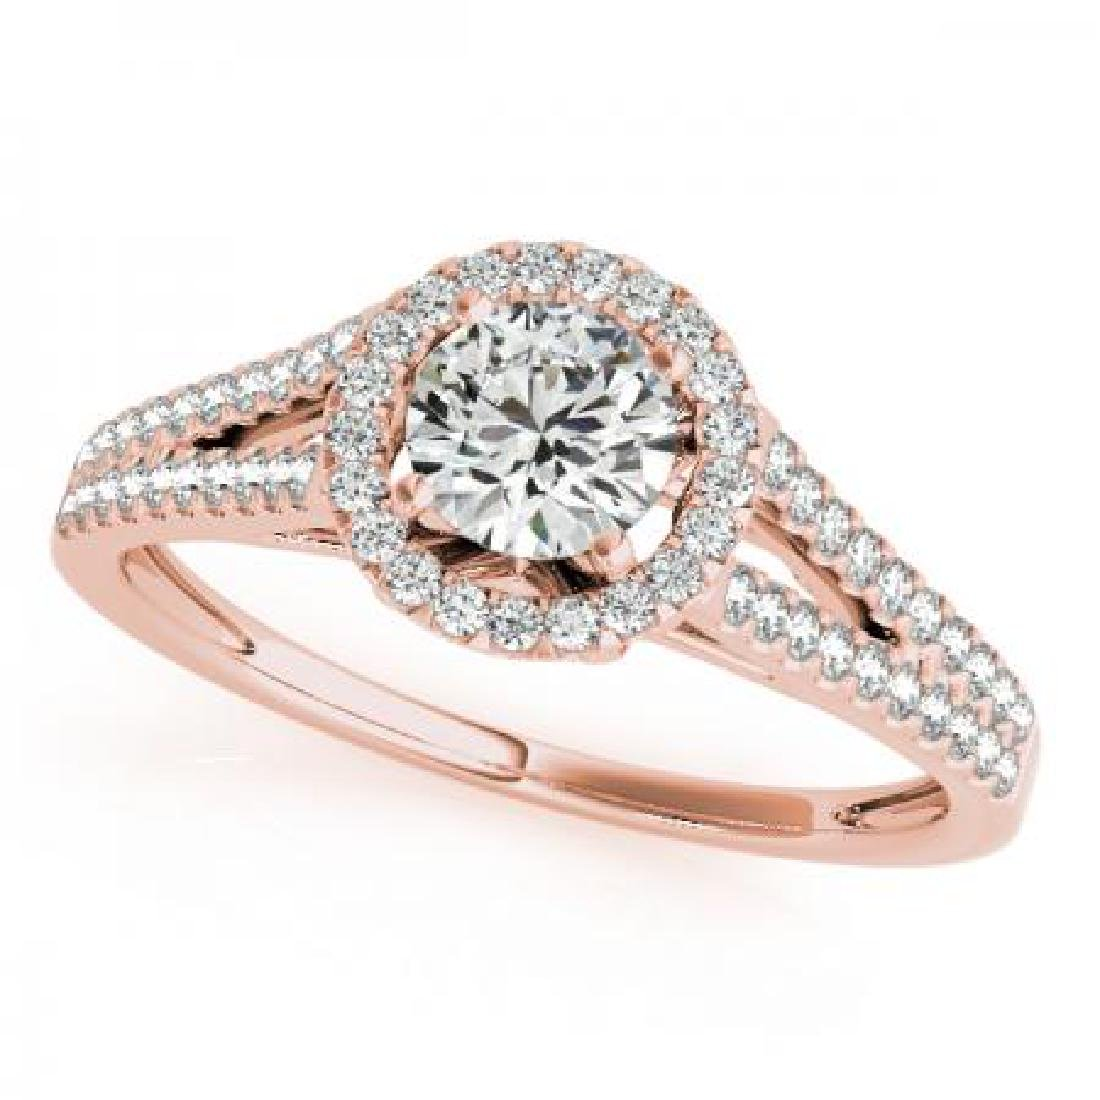 CERTIFIED 18K ROSE GOLD 1.11 CT G-H/VS-SI1 DIAMOND HALO